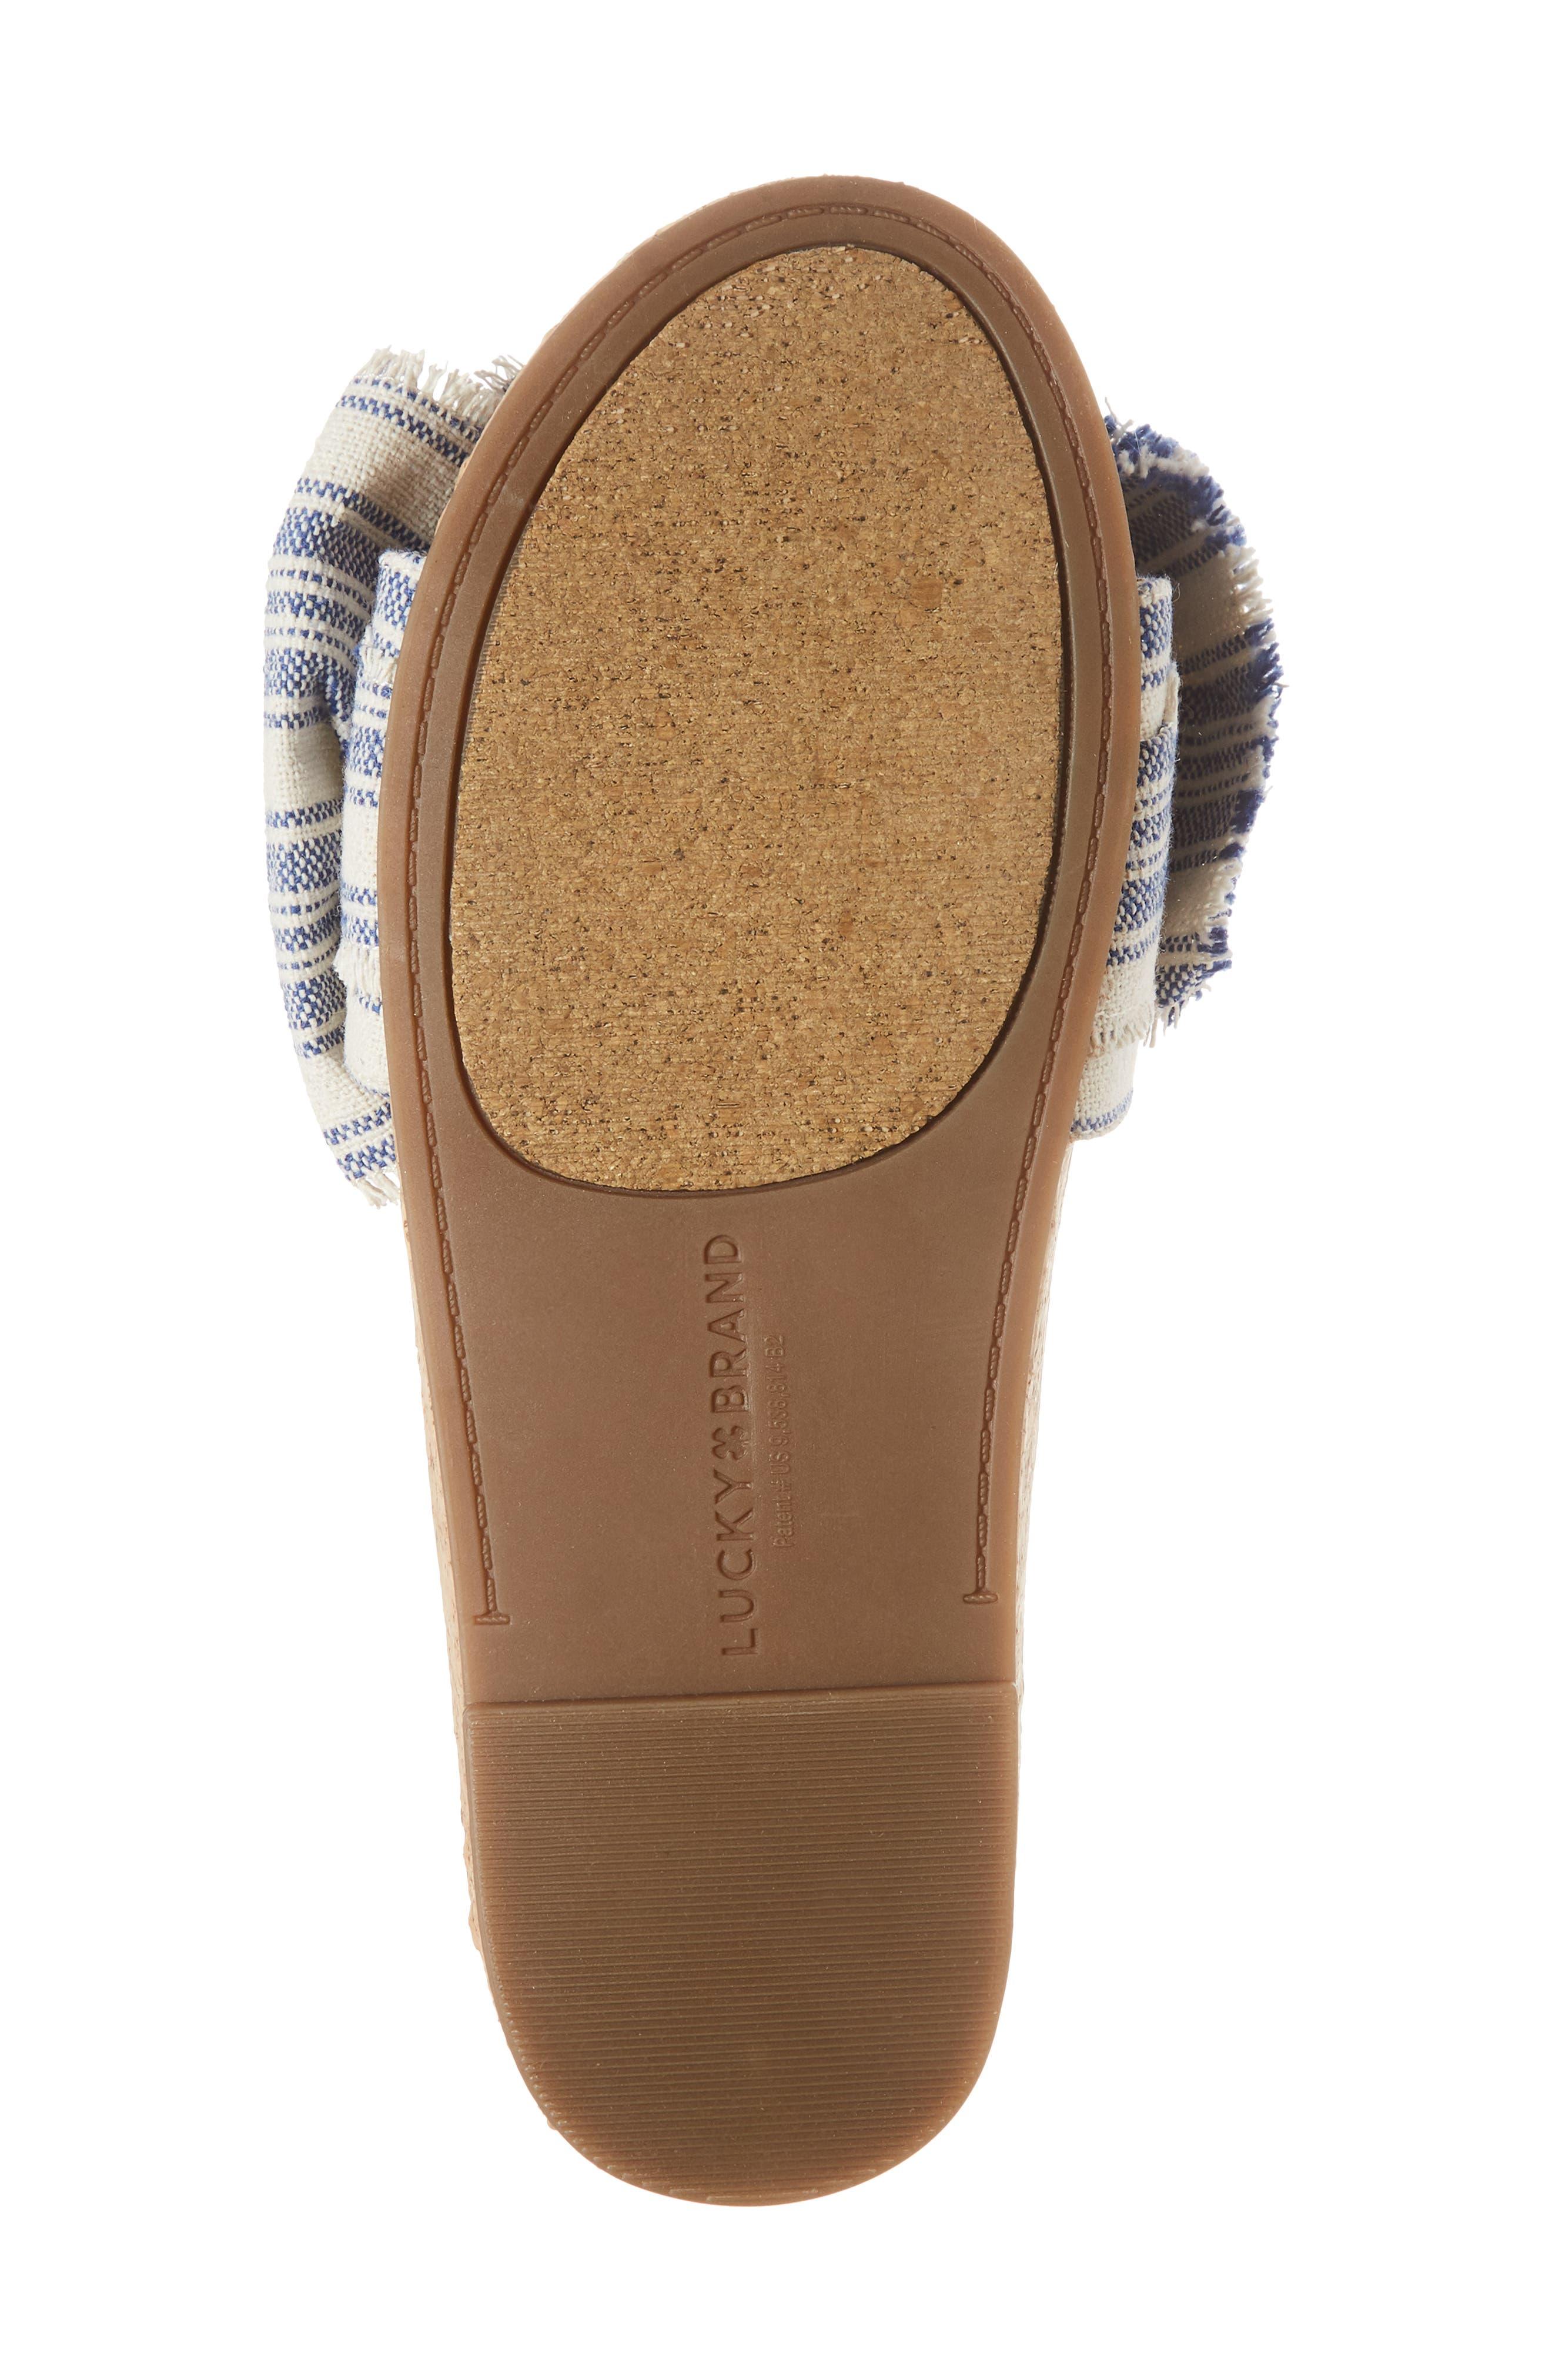 Floella Bow Slide Sandal,                             Alternate thumbnail 6, color,                             Lapis Leather